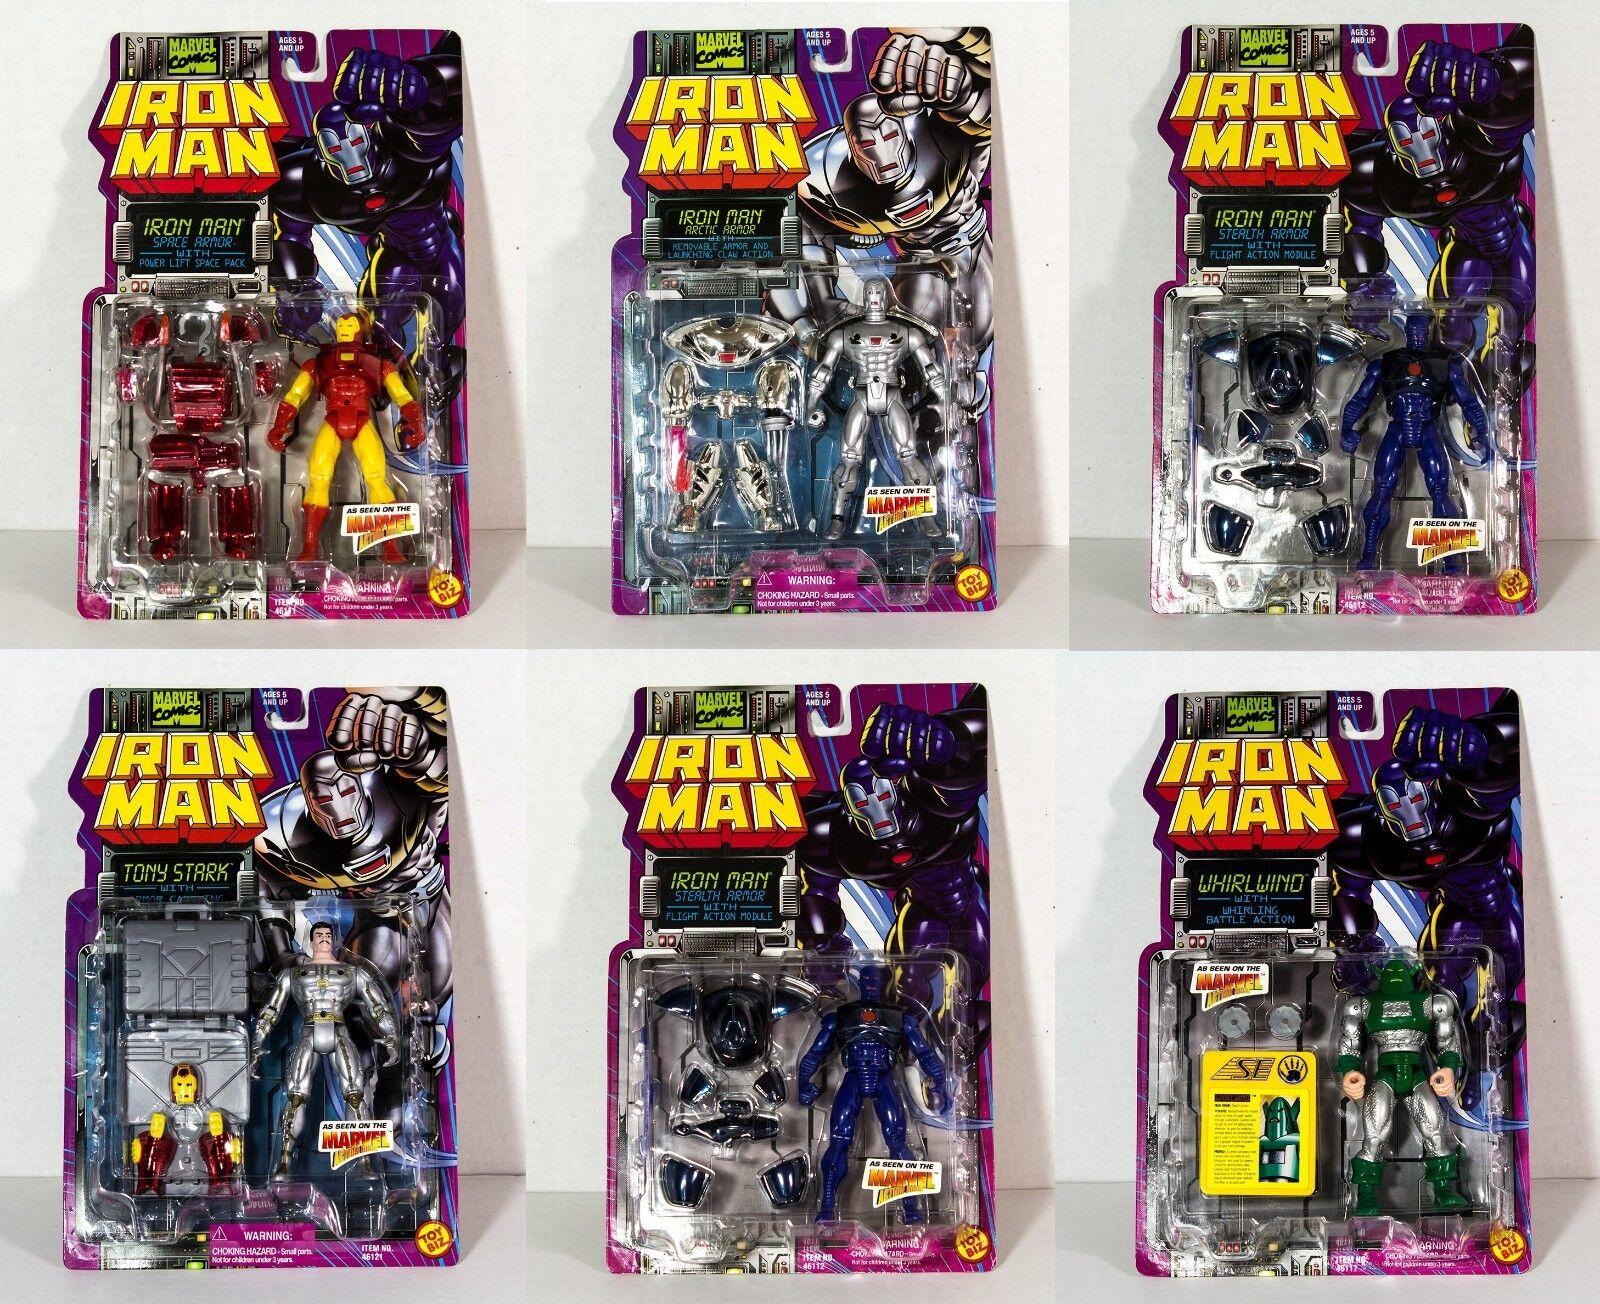 IRON MAN - TONY STARK Collection 6 Vintage Action Figures Toy Biz 1994 Marvel